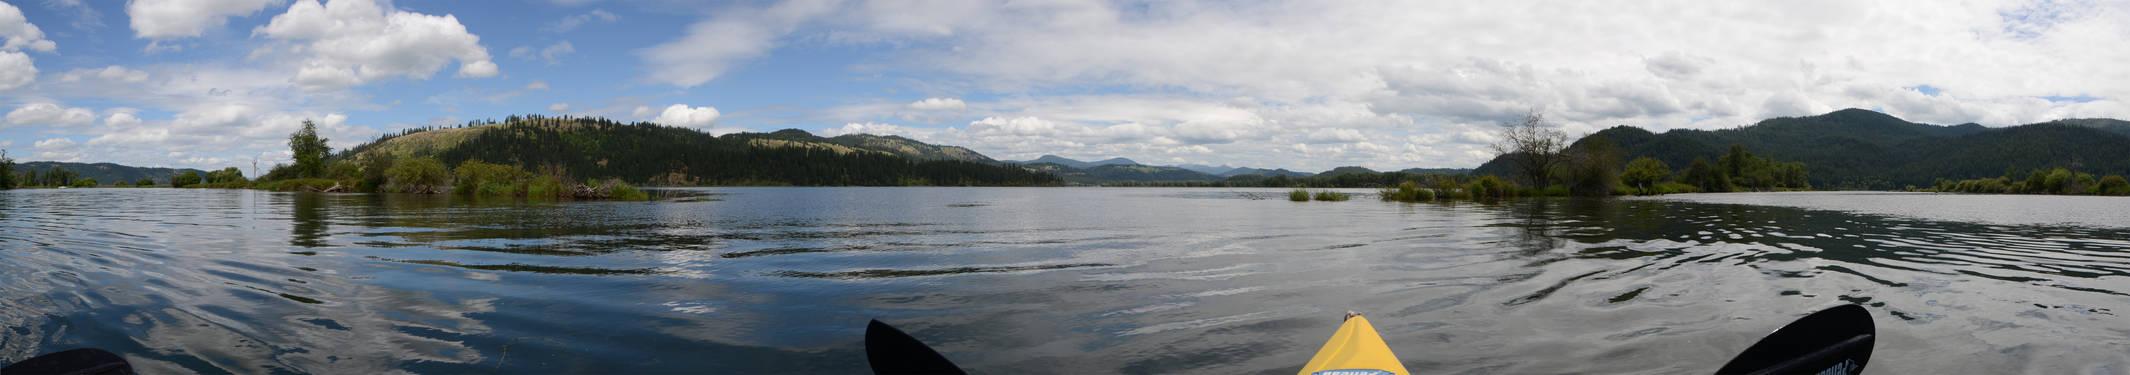 St. Joe River 2012-06-29 3